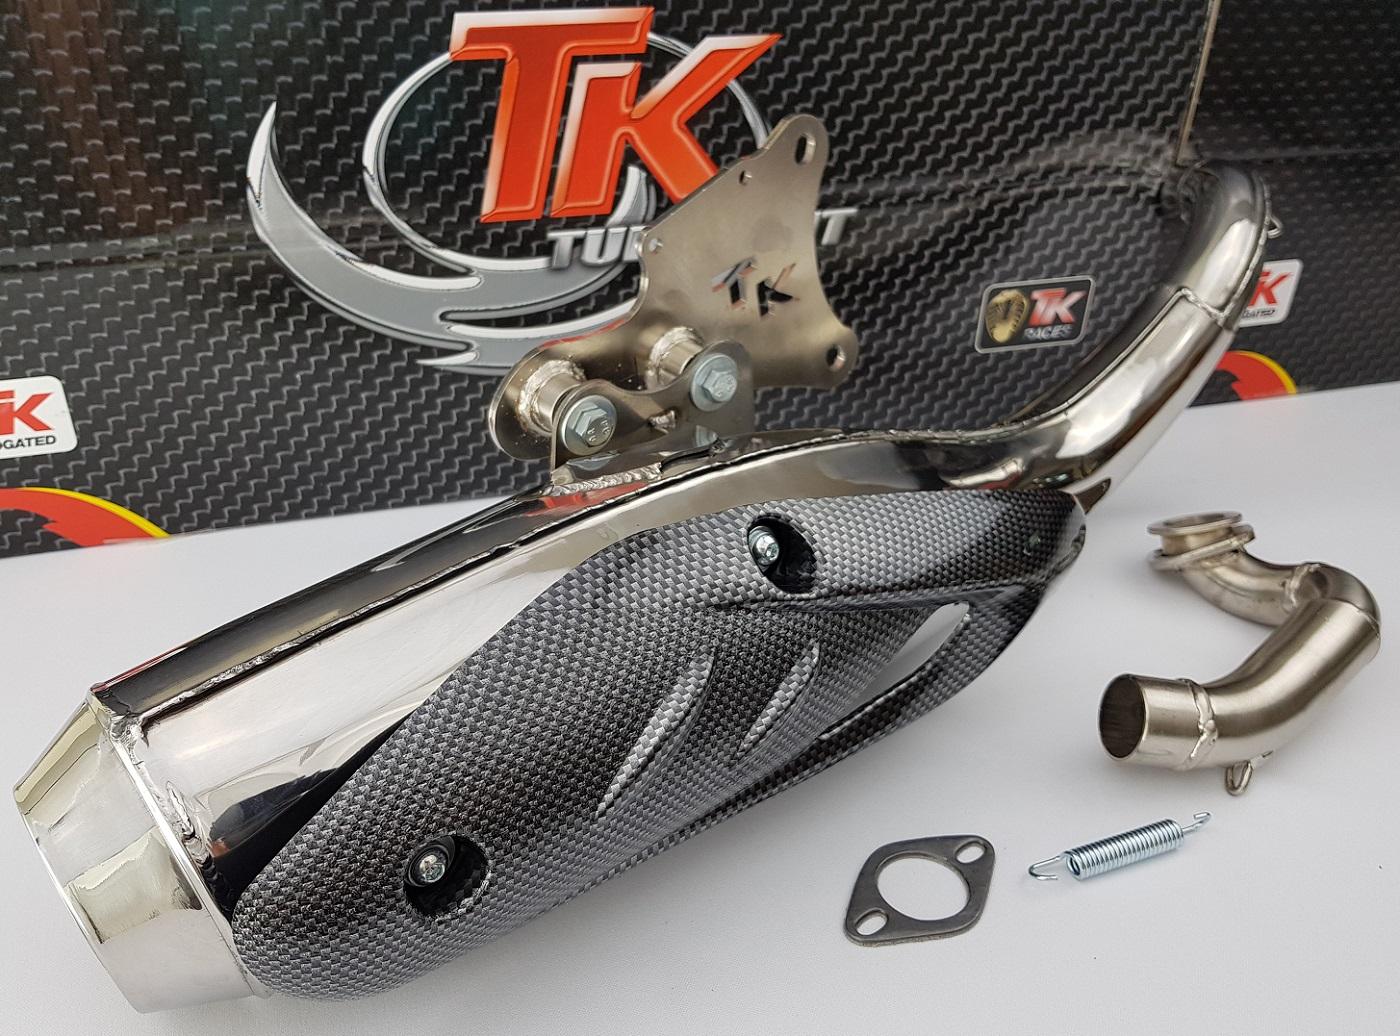 turbo kit tkr sport in edelstahl auspuff peugeot speedfight stehend 50 scooter roller teile. Black Bedroom Furniture Sets. Home Design Ideas